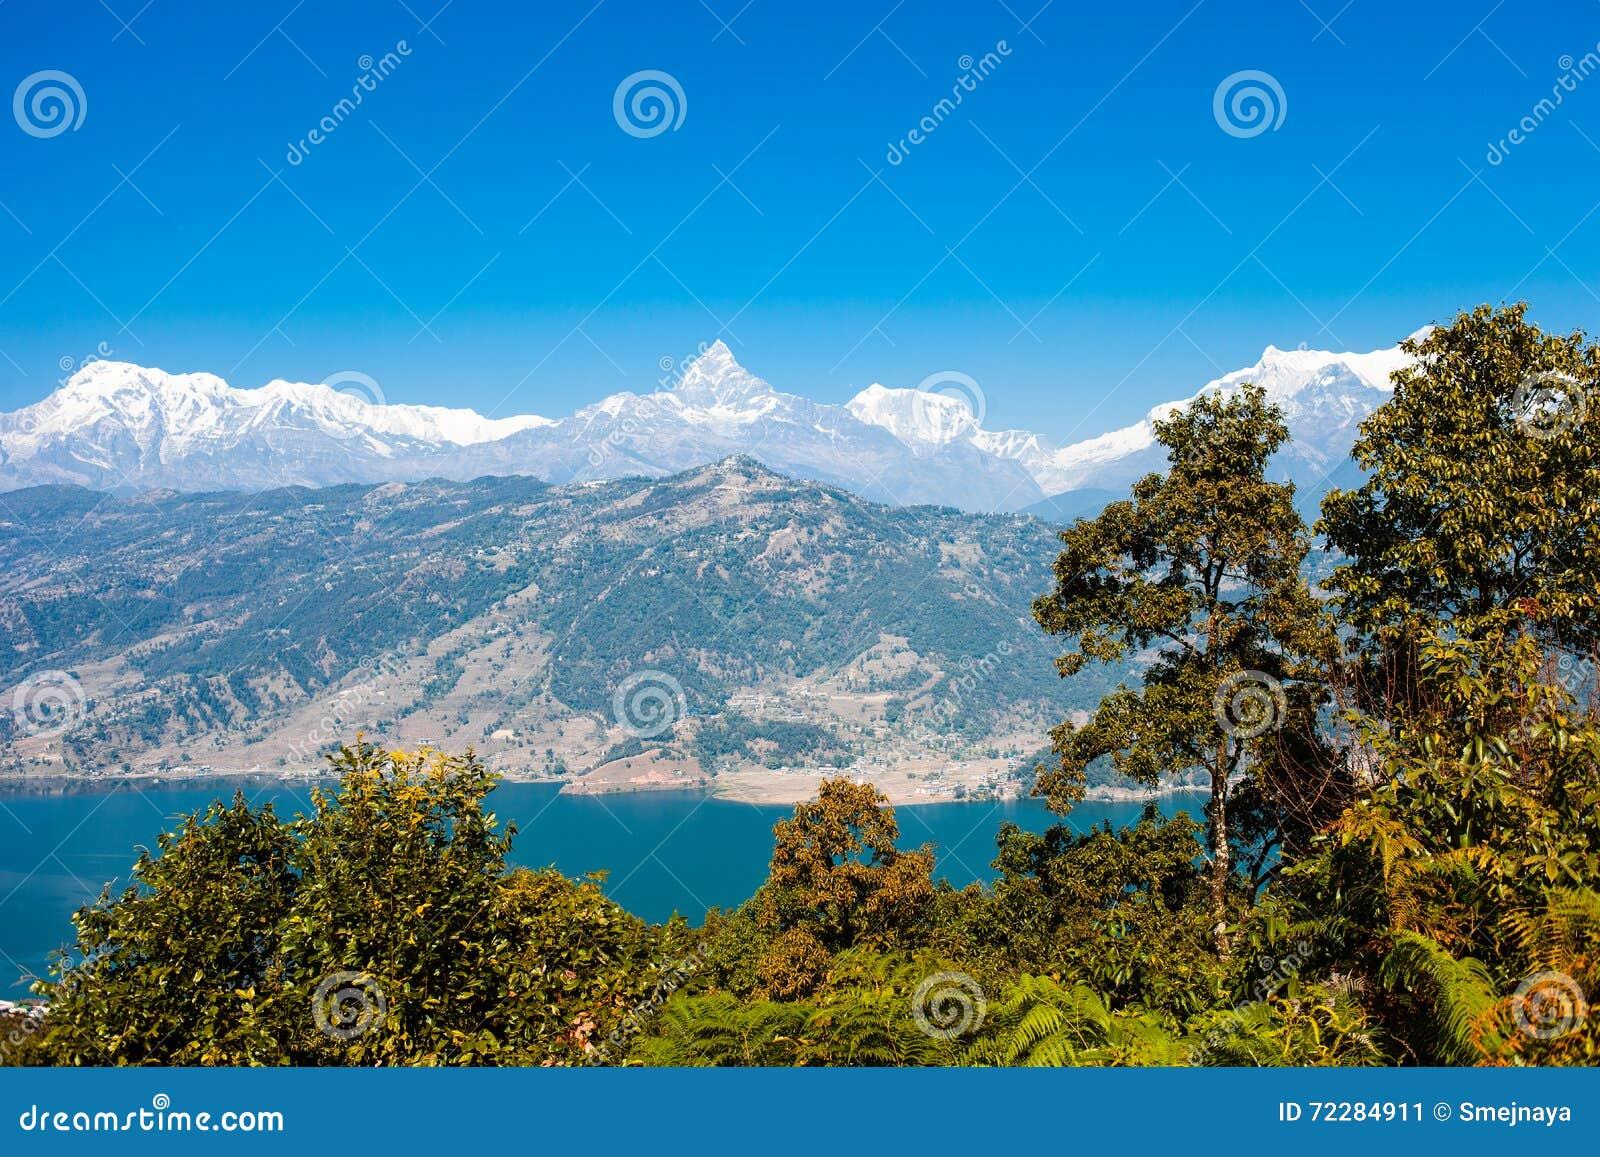 Download Взгляд озера Phewa и горной цепи Annapurna Стоковое Изображение - изображение насчитывающей бобра, сценарно: 72284911